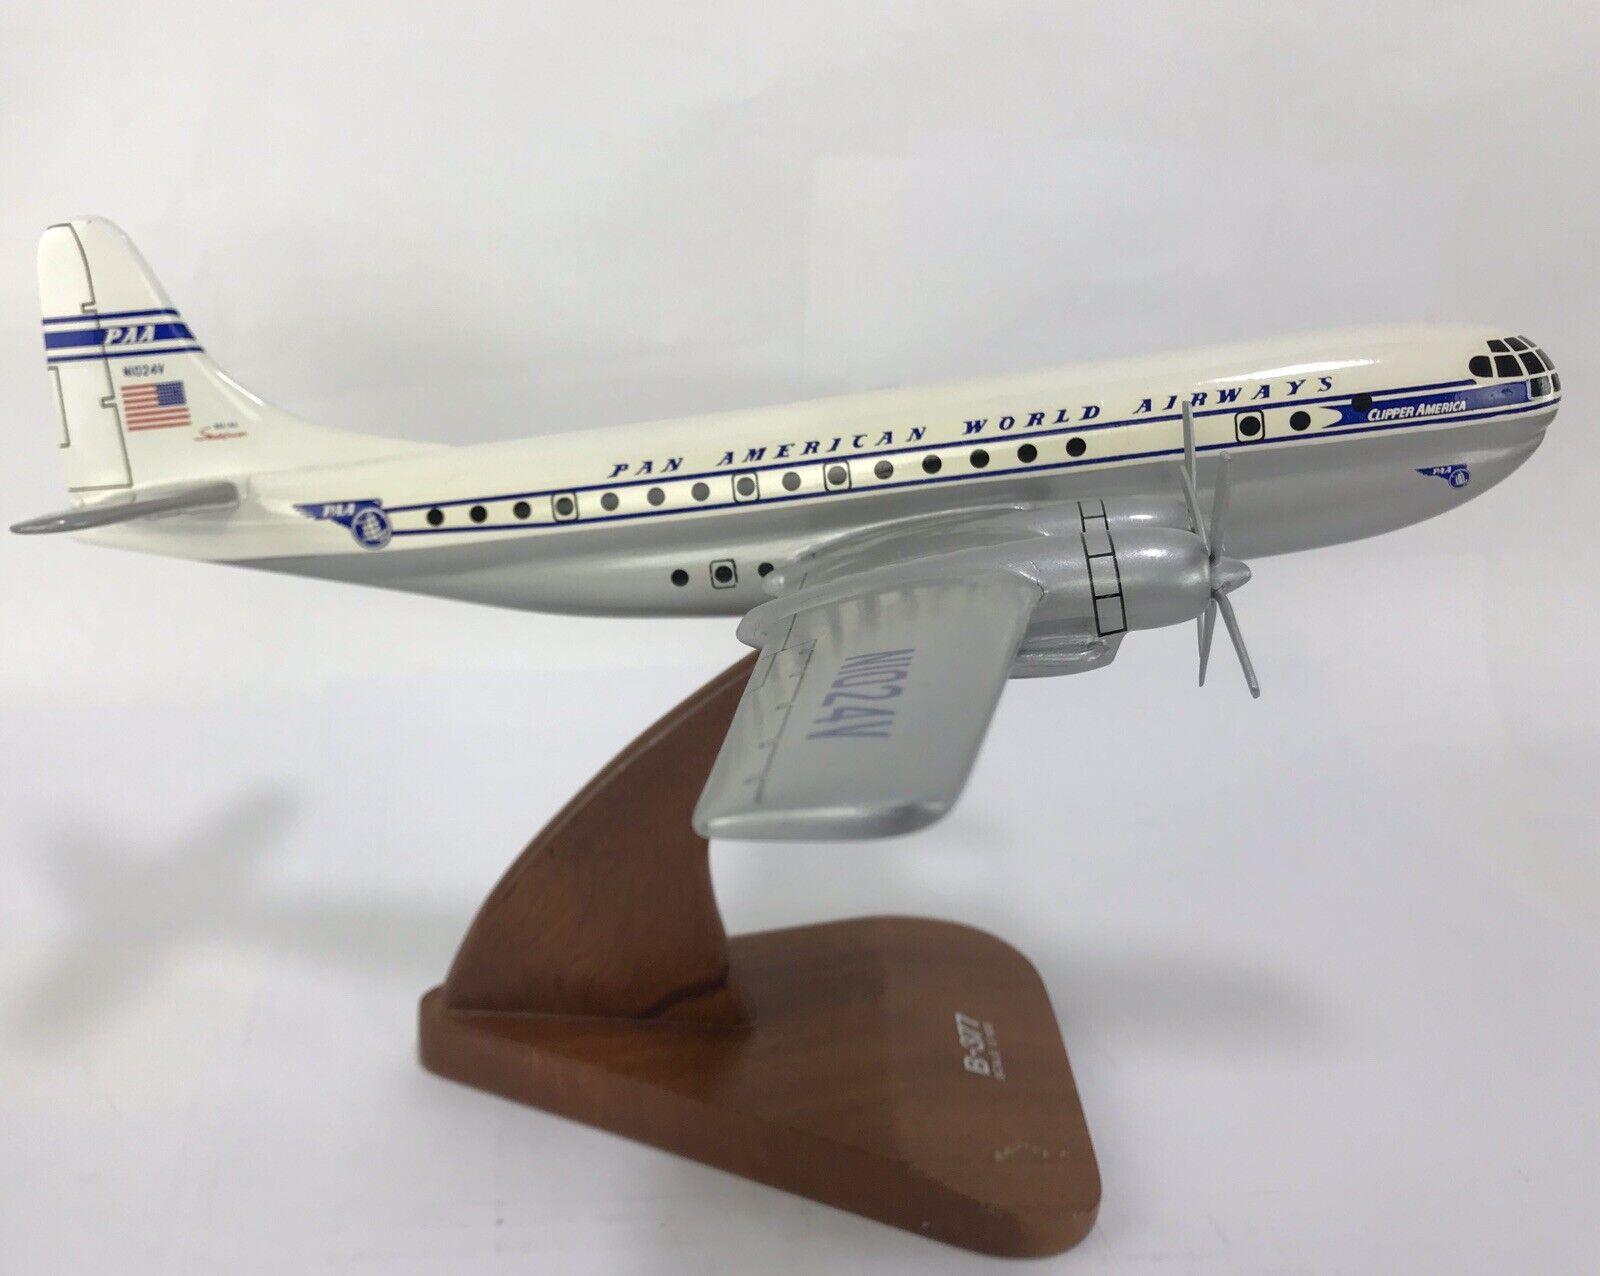 Pan American Pan Am Boeing B-377 Stratocruiser Wood Wooden Model Airplane